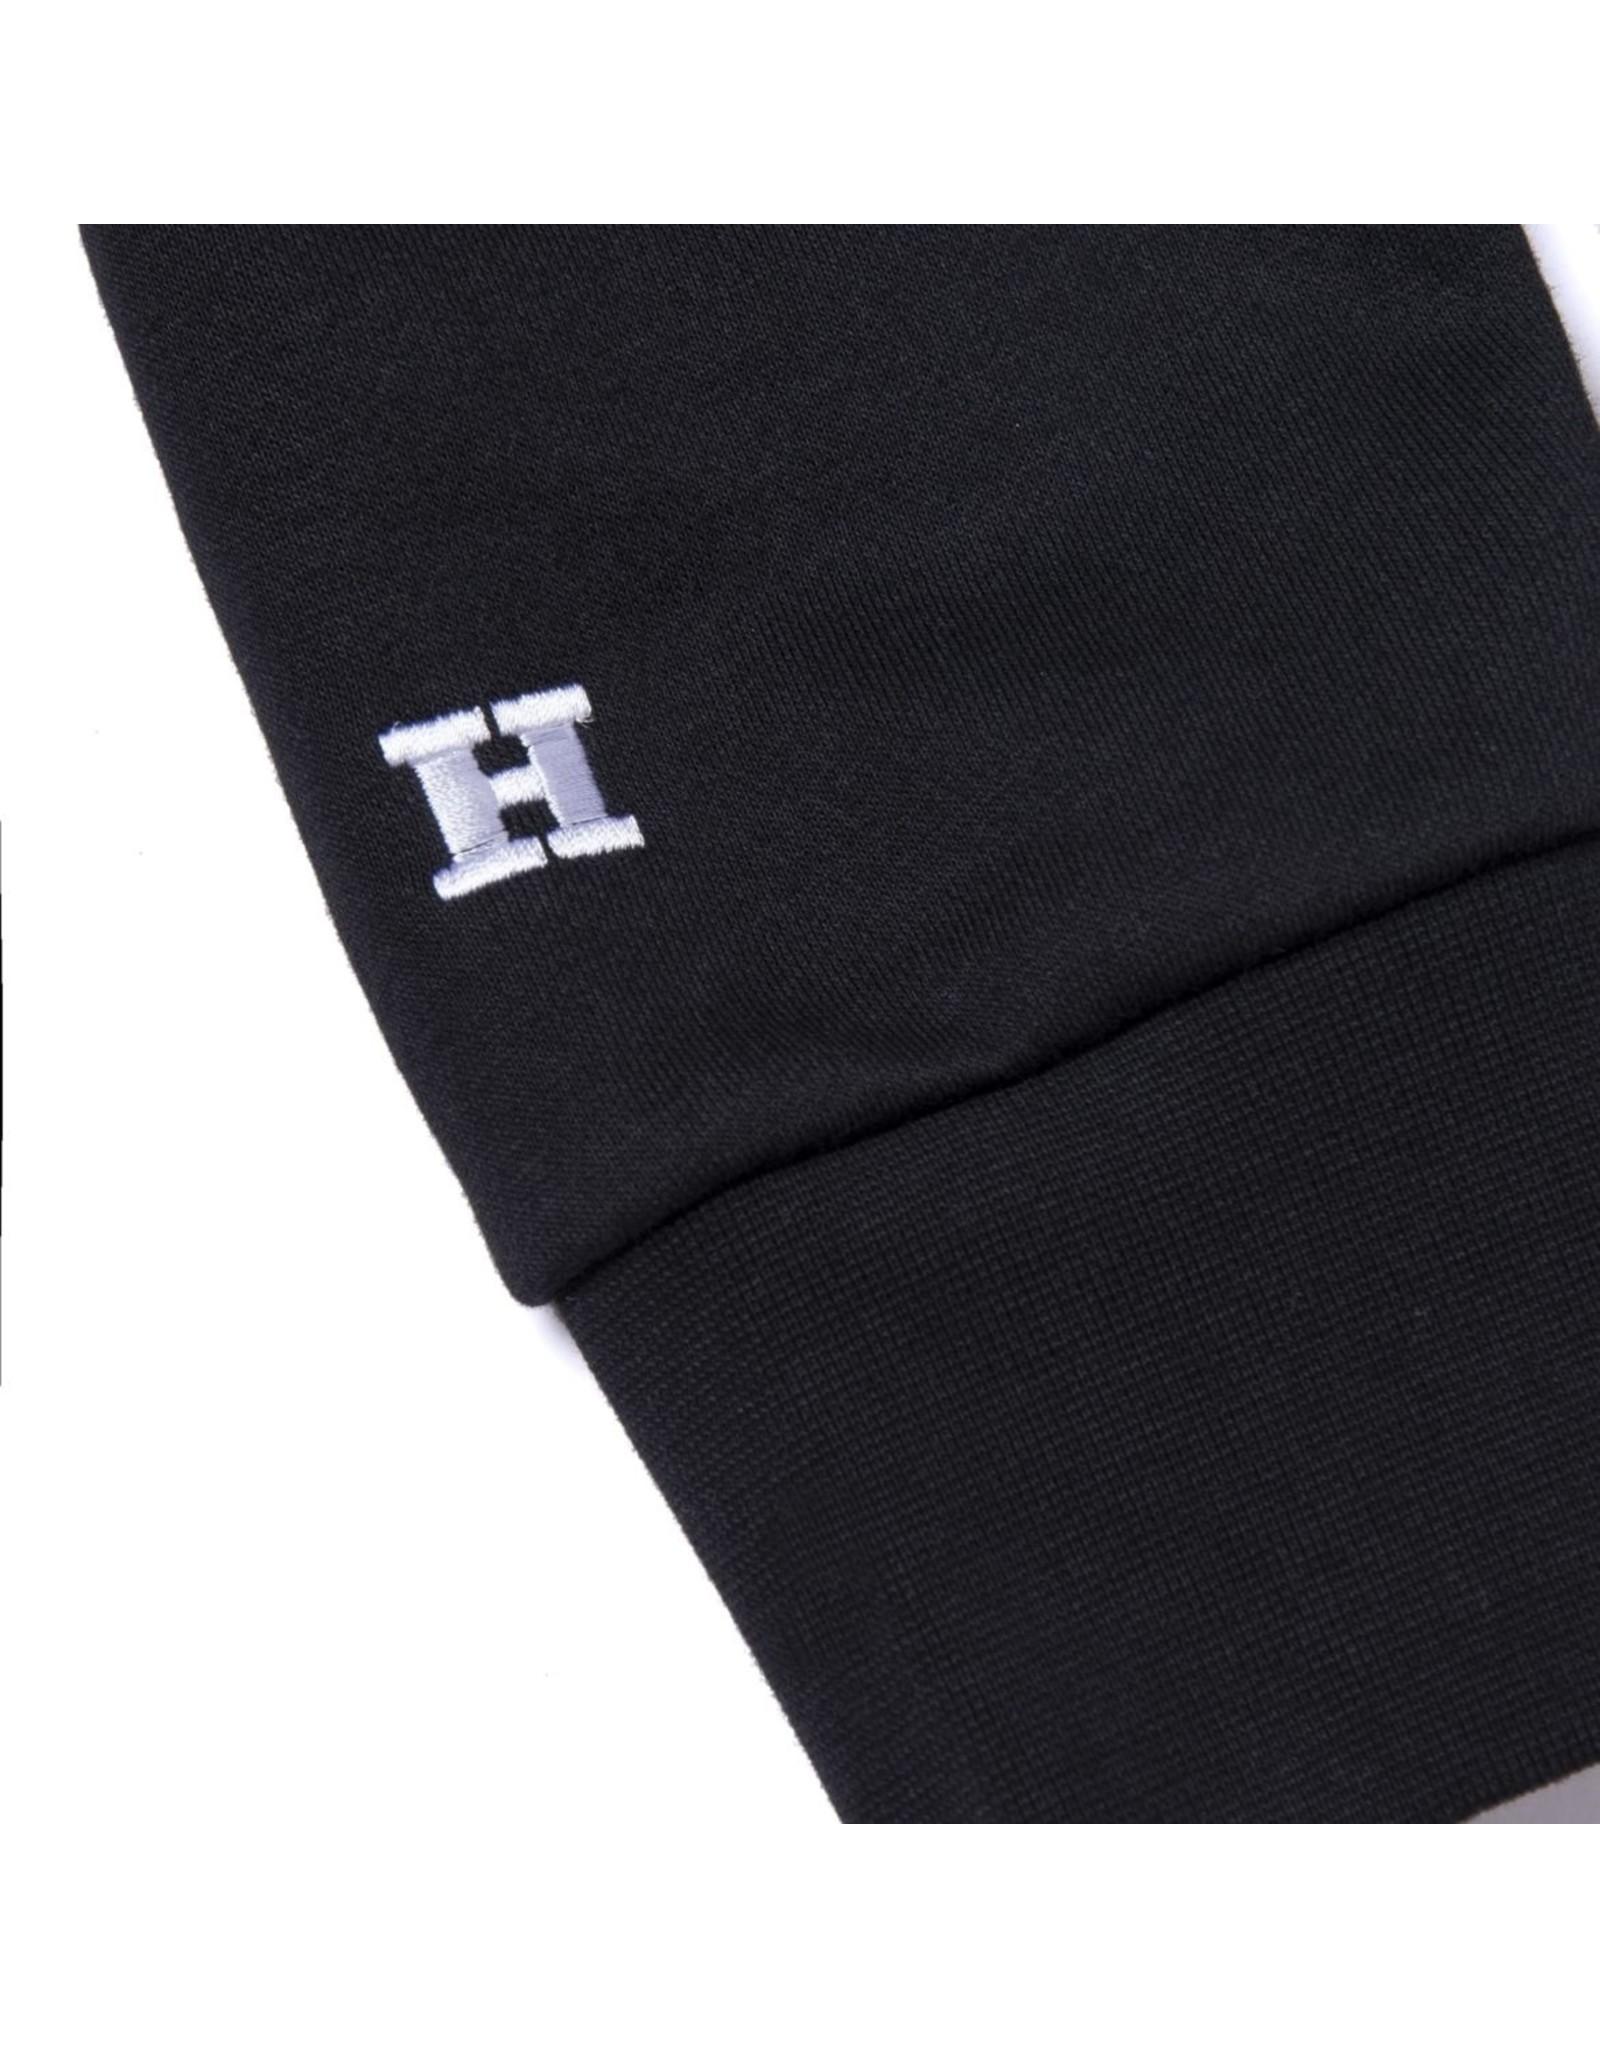 HUF HUF - PLAYBOY COLOYR BLOCK HOODIE - BLACK -